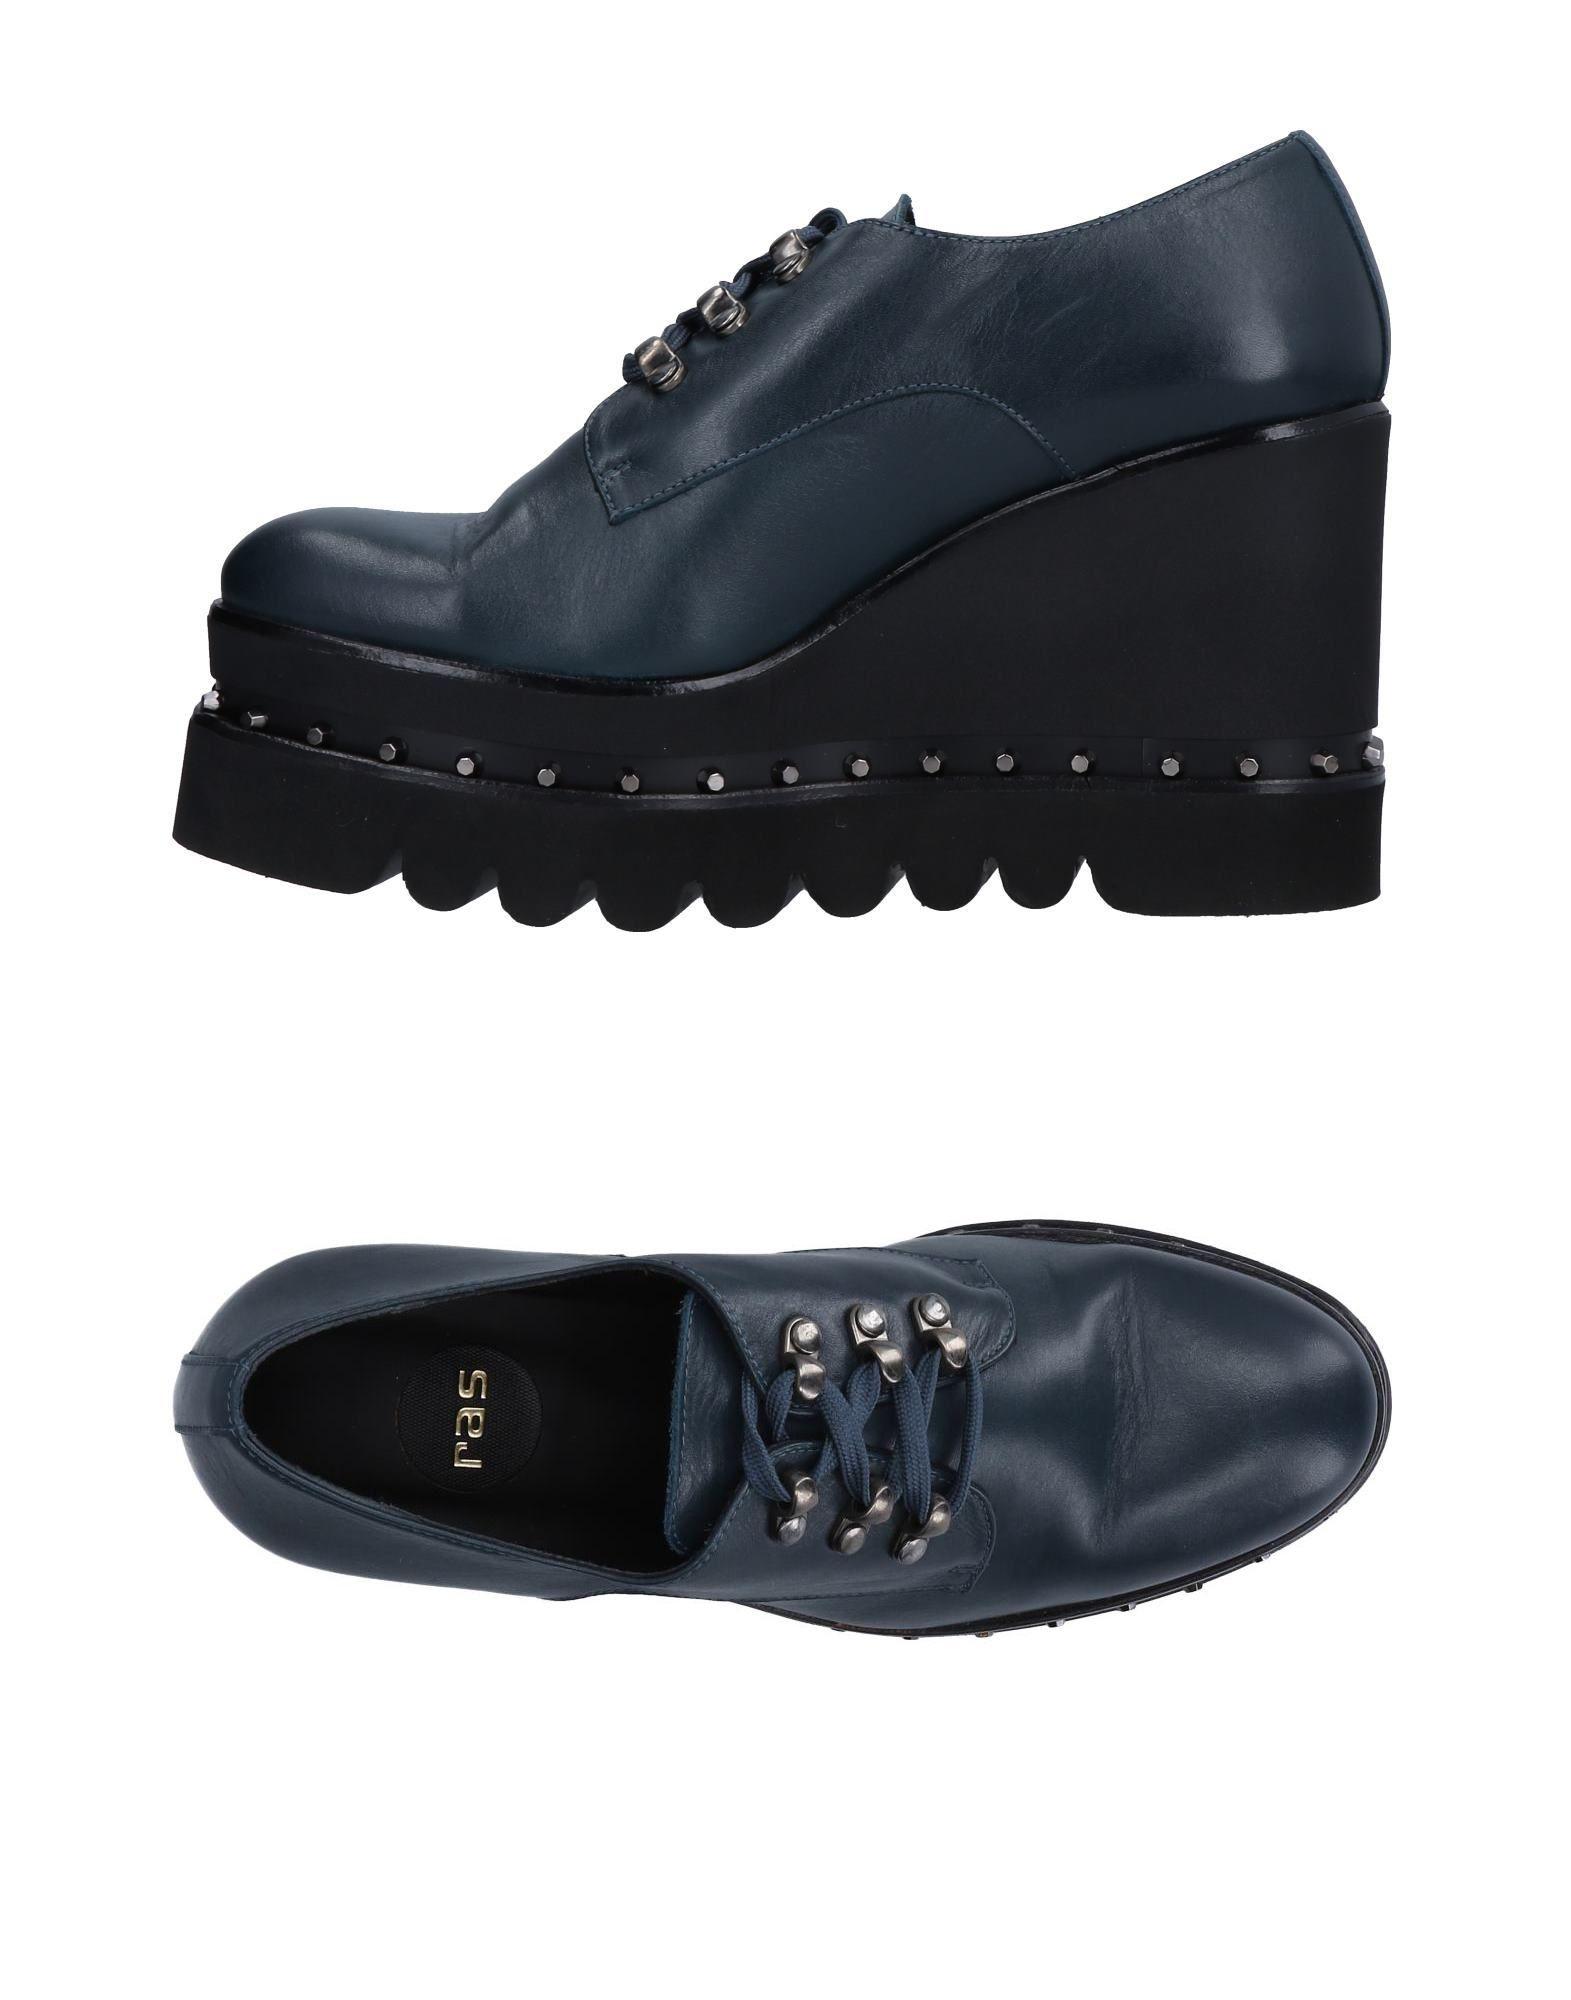 Фото - RAS Обувь на шнурках обувь на высокой платформе dkny